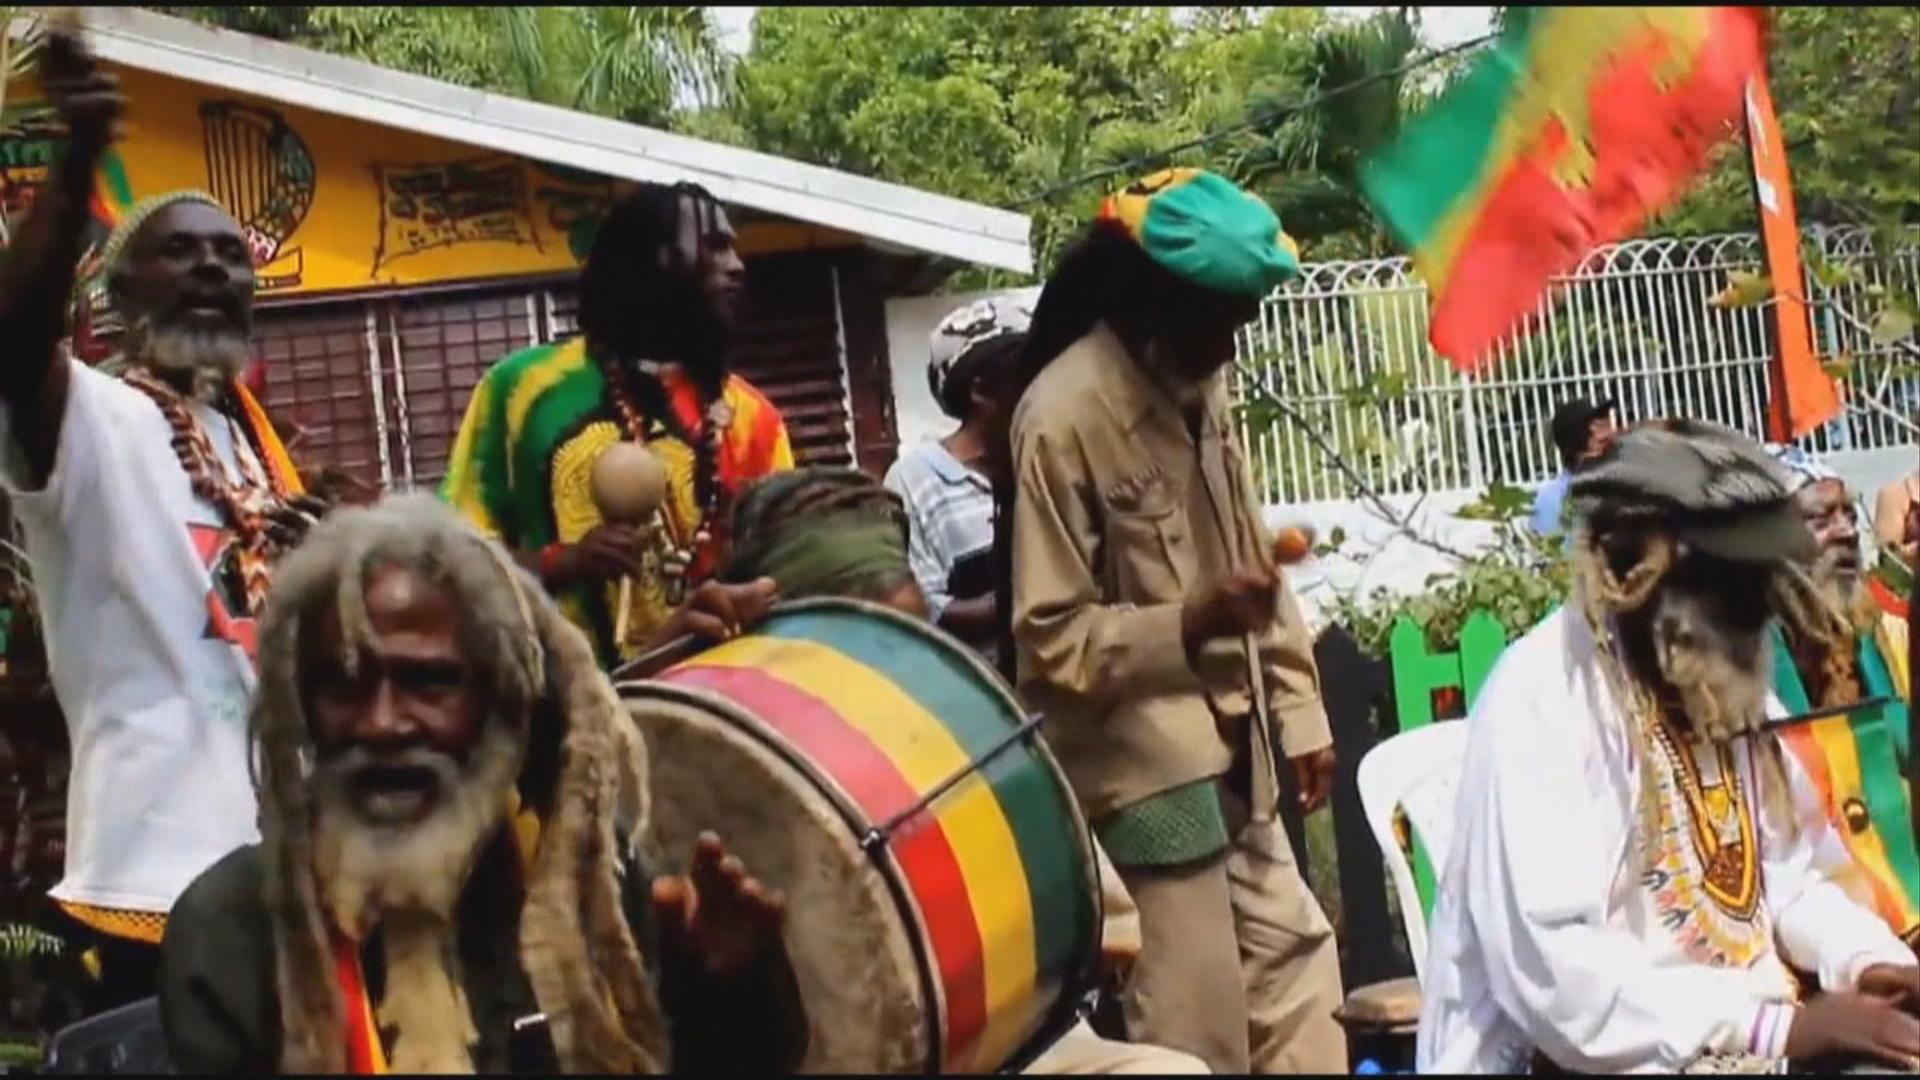 Chinese Rastafarian from the Rastafarian group